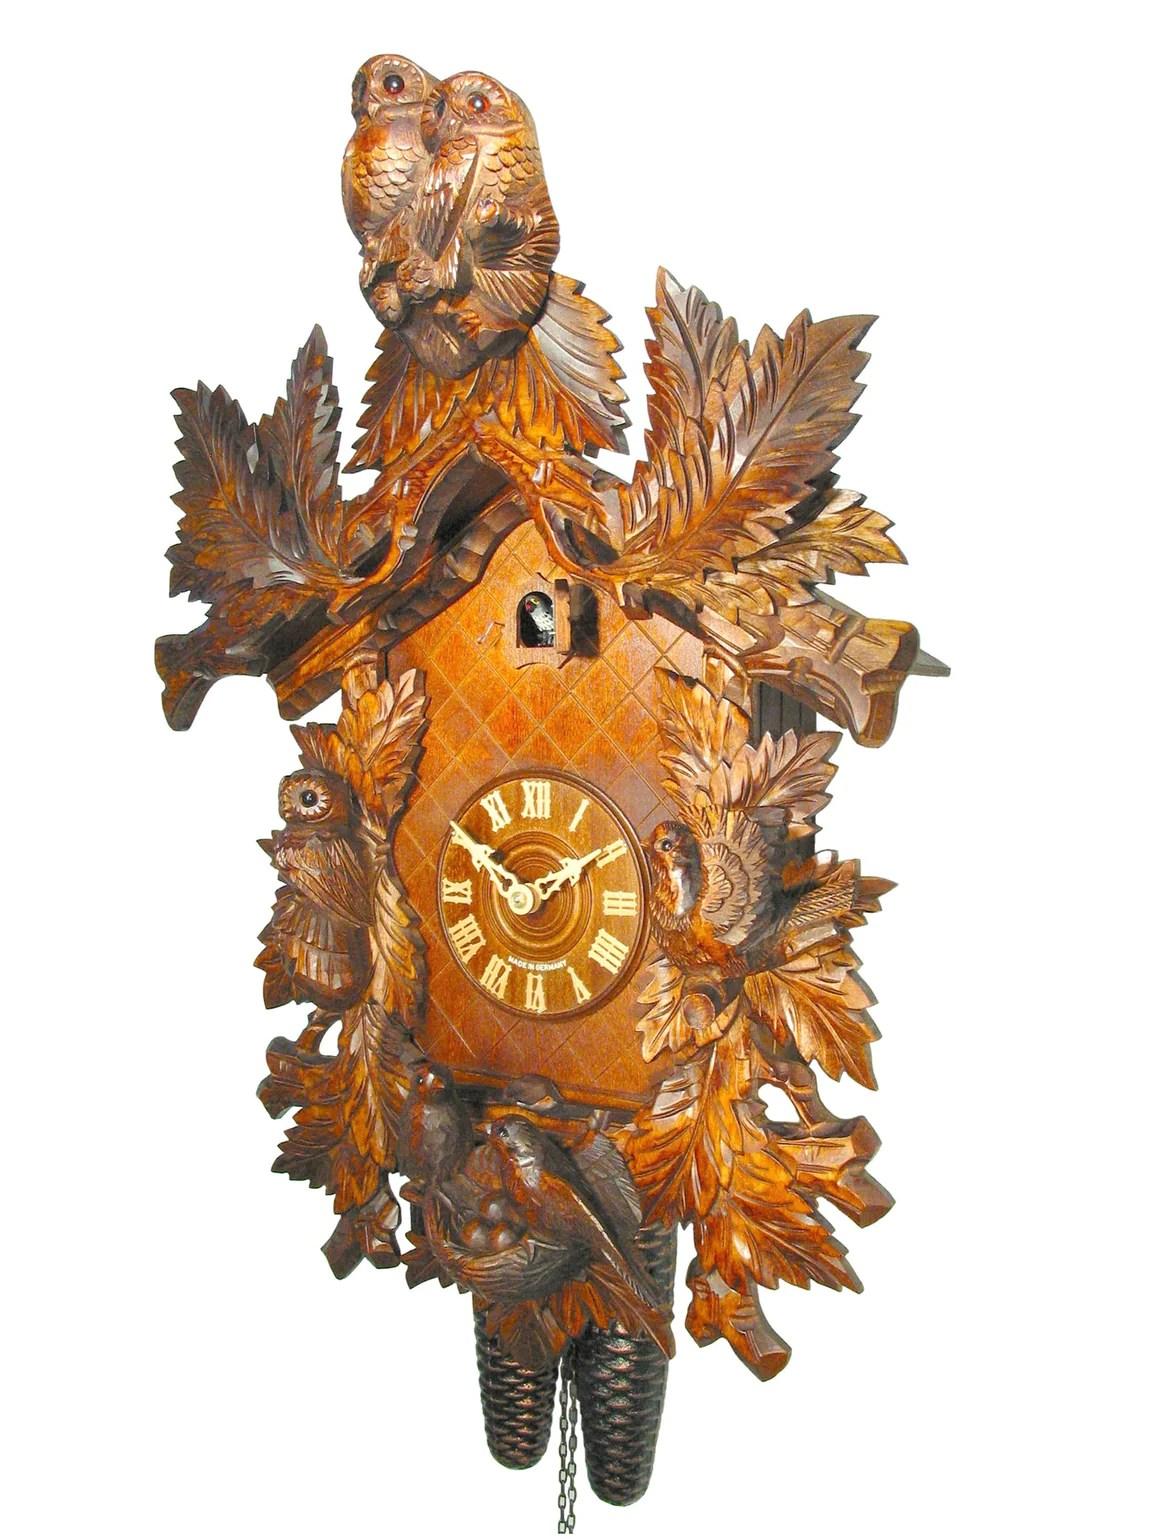 August Schwer Cuckoo Clock with Owls